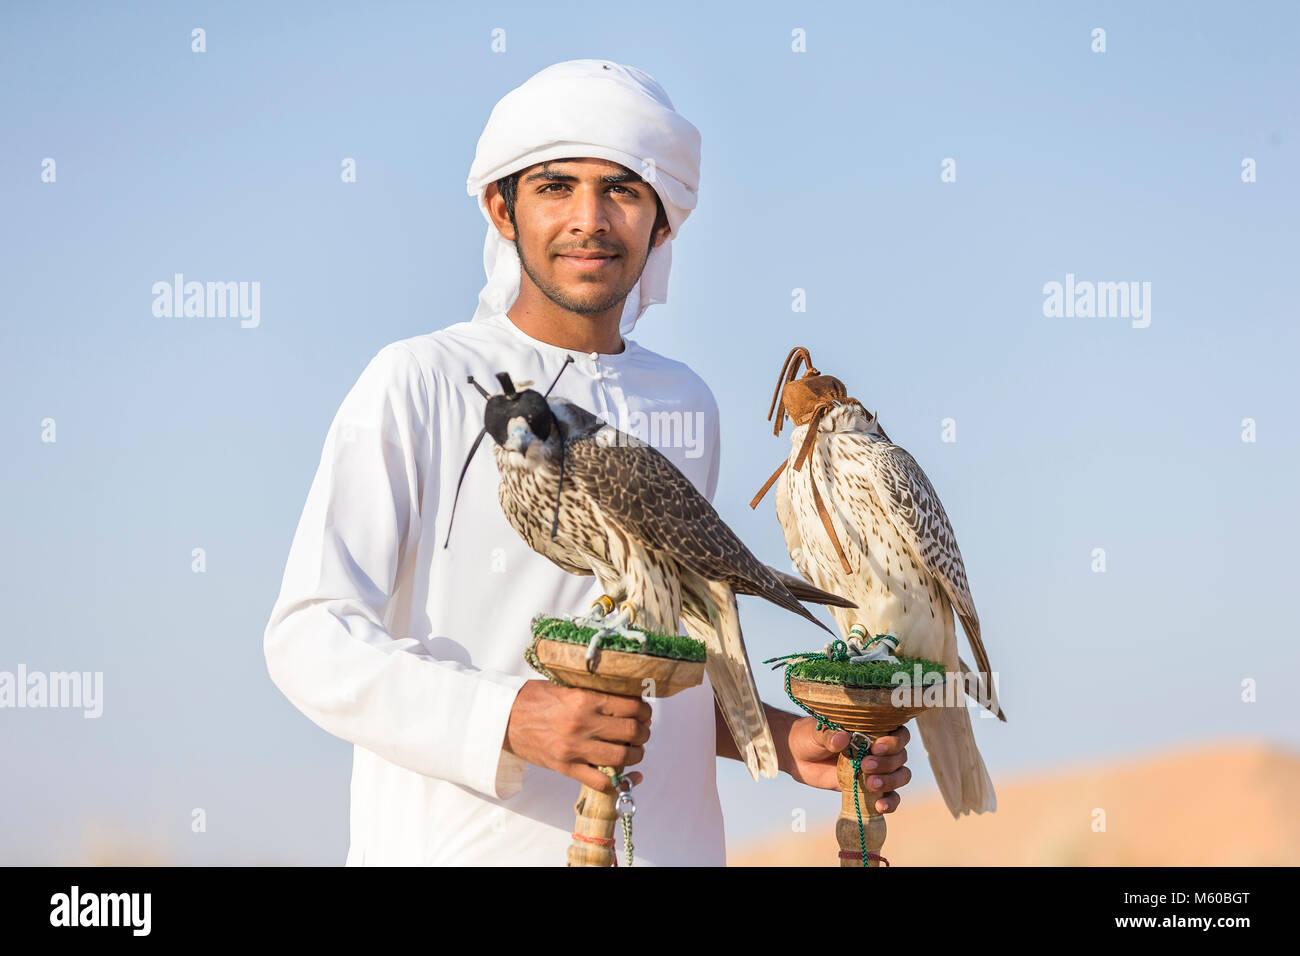 Saker Falcon (Falco cherrug). Falconer carrying a trained birds on their blocks. Abu Dhabi - Stock Image